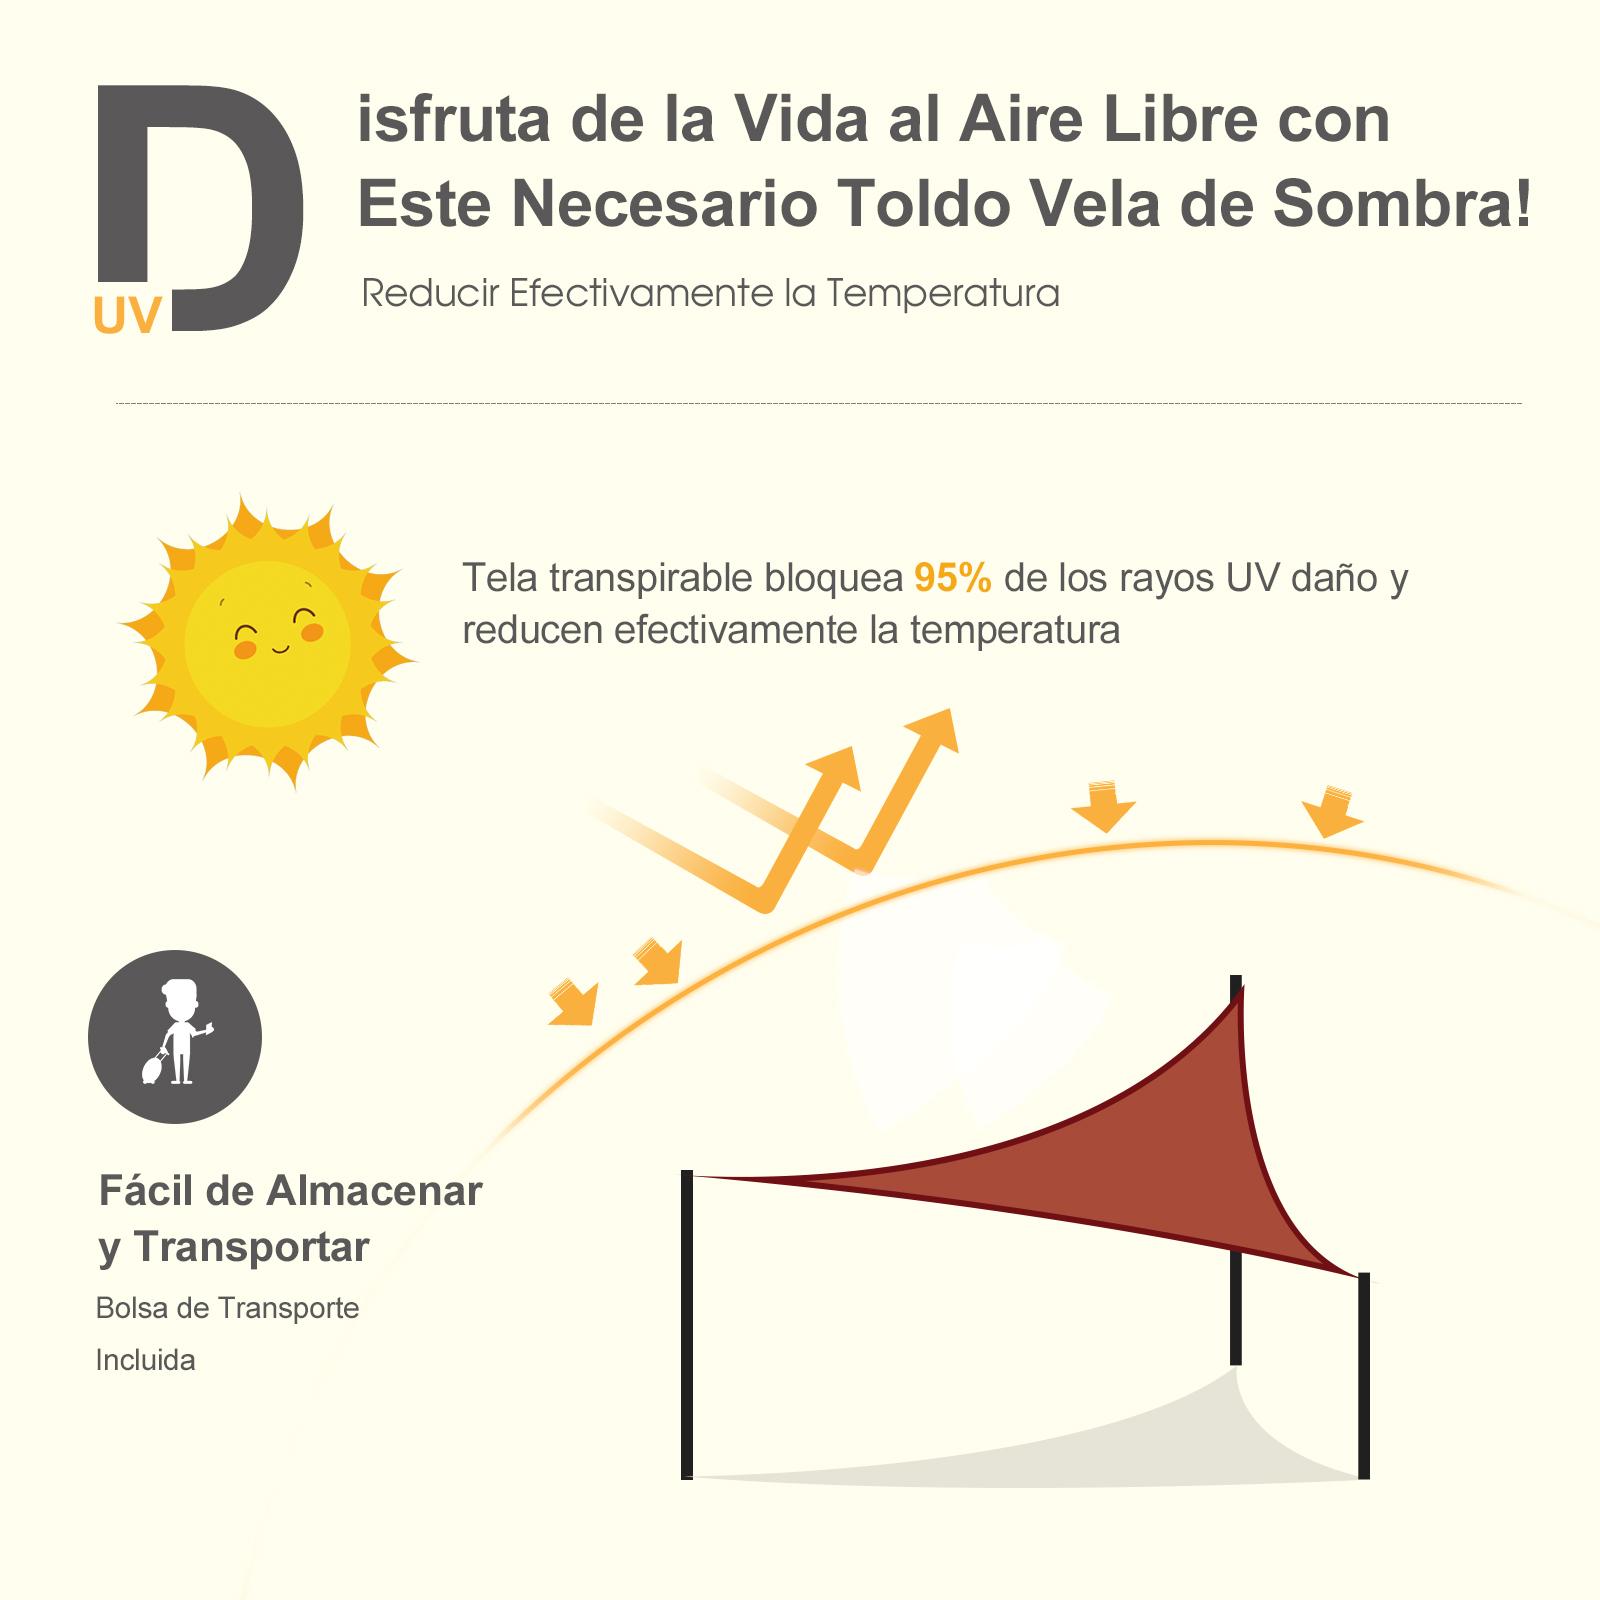 Toldo-Vela-Sombrilla-Parasol-Triangulo-Tejido-de-Poliester-160g-m2-Jardin-Playa miniatura 23